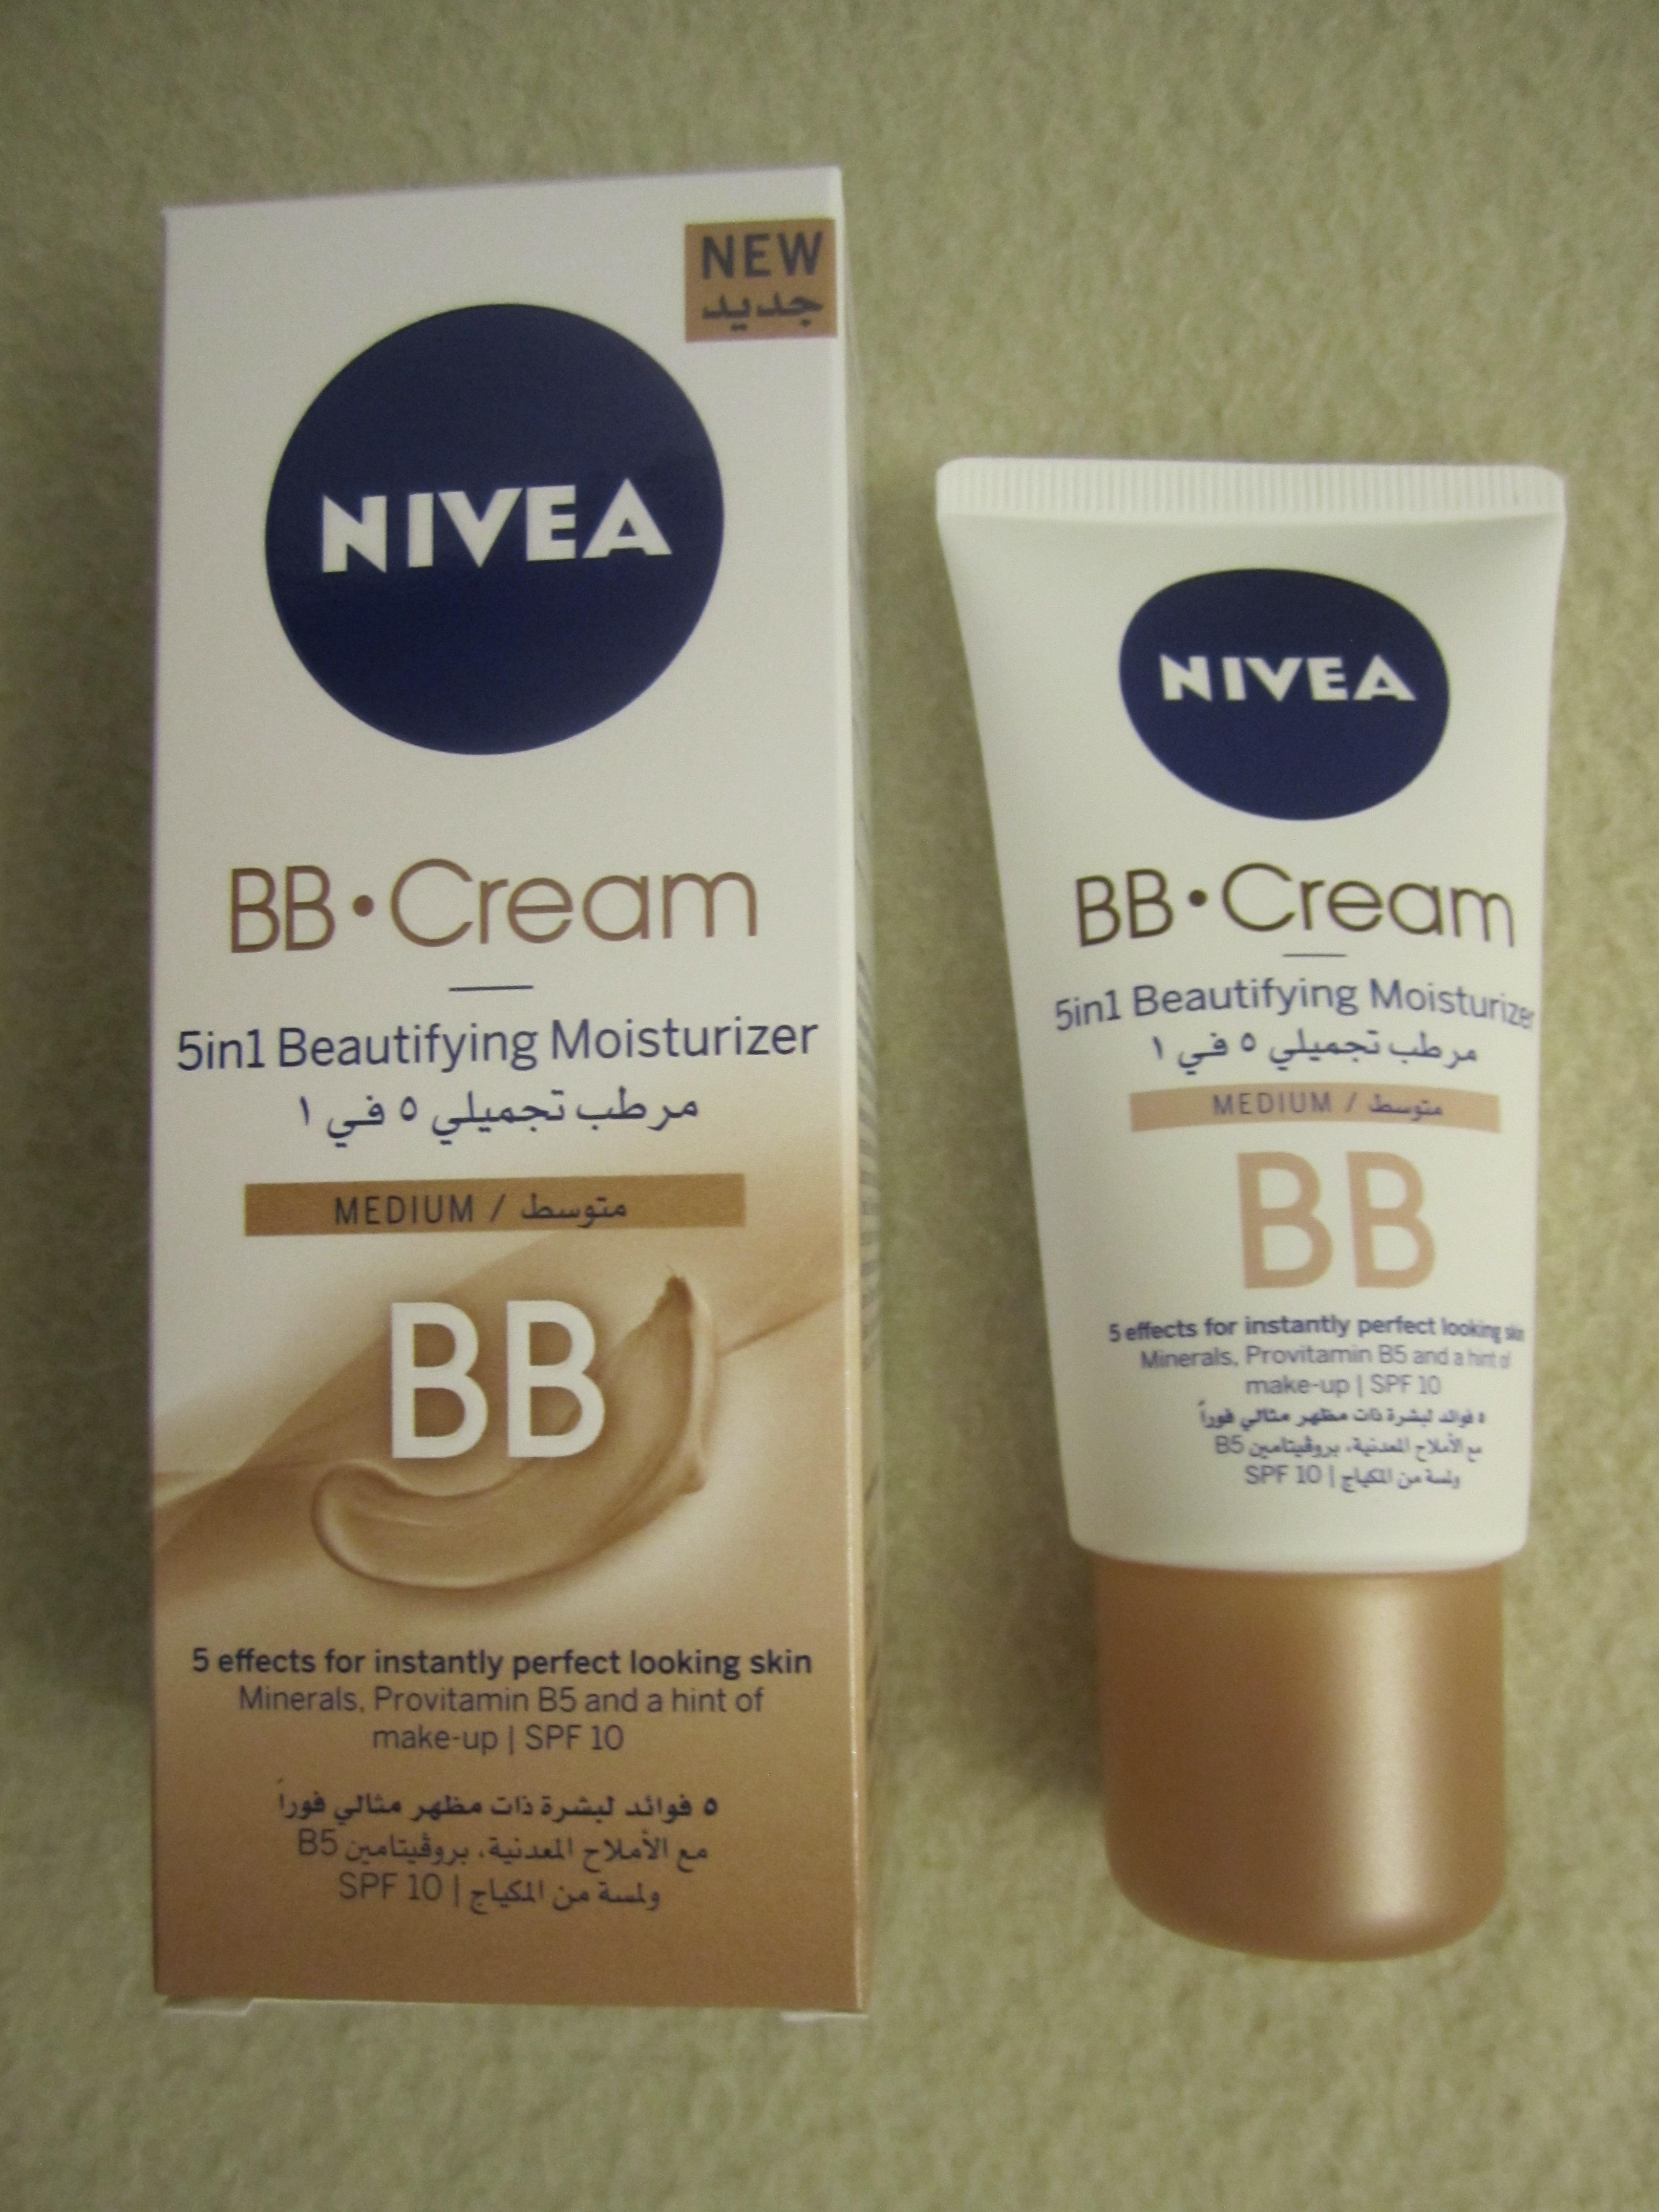 review nivea bb cream 5 in 1 beautifying moisturizer nazninazeez. Black Bedroom Furniture Sets. Home Design Ideas